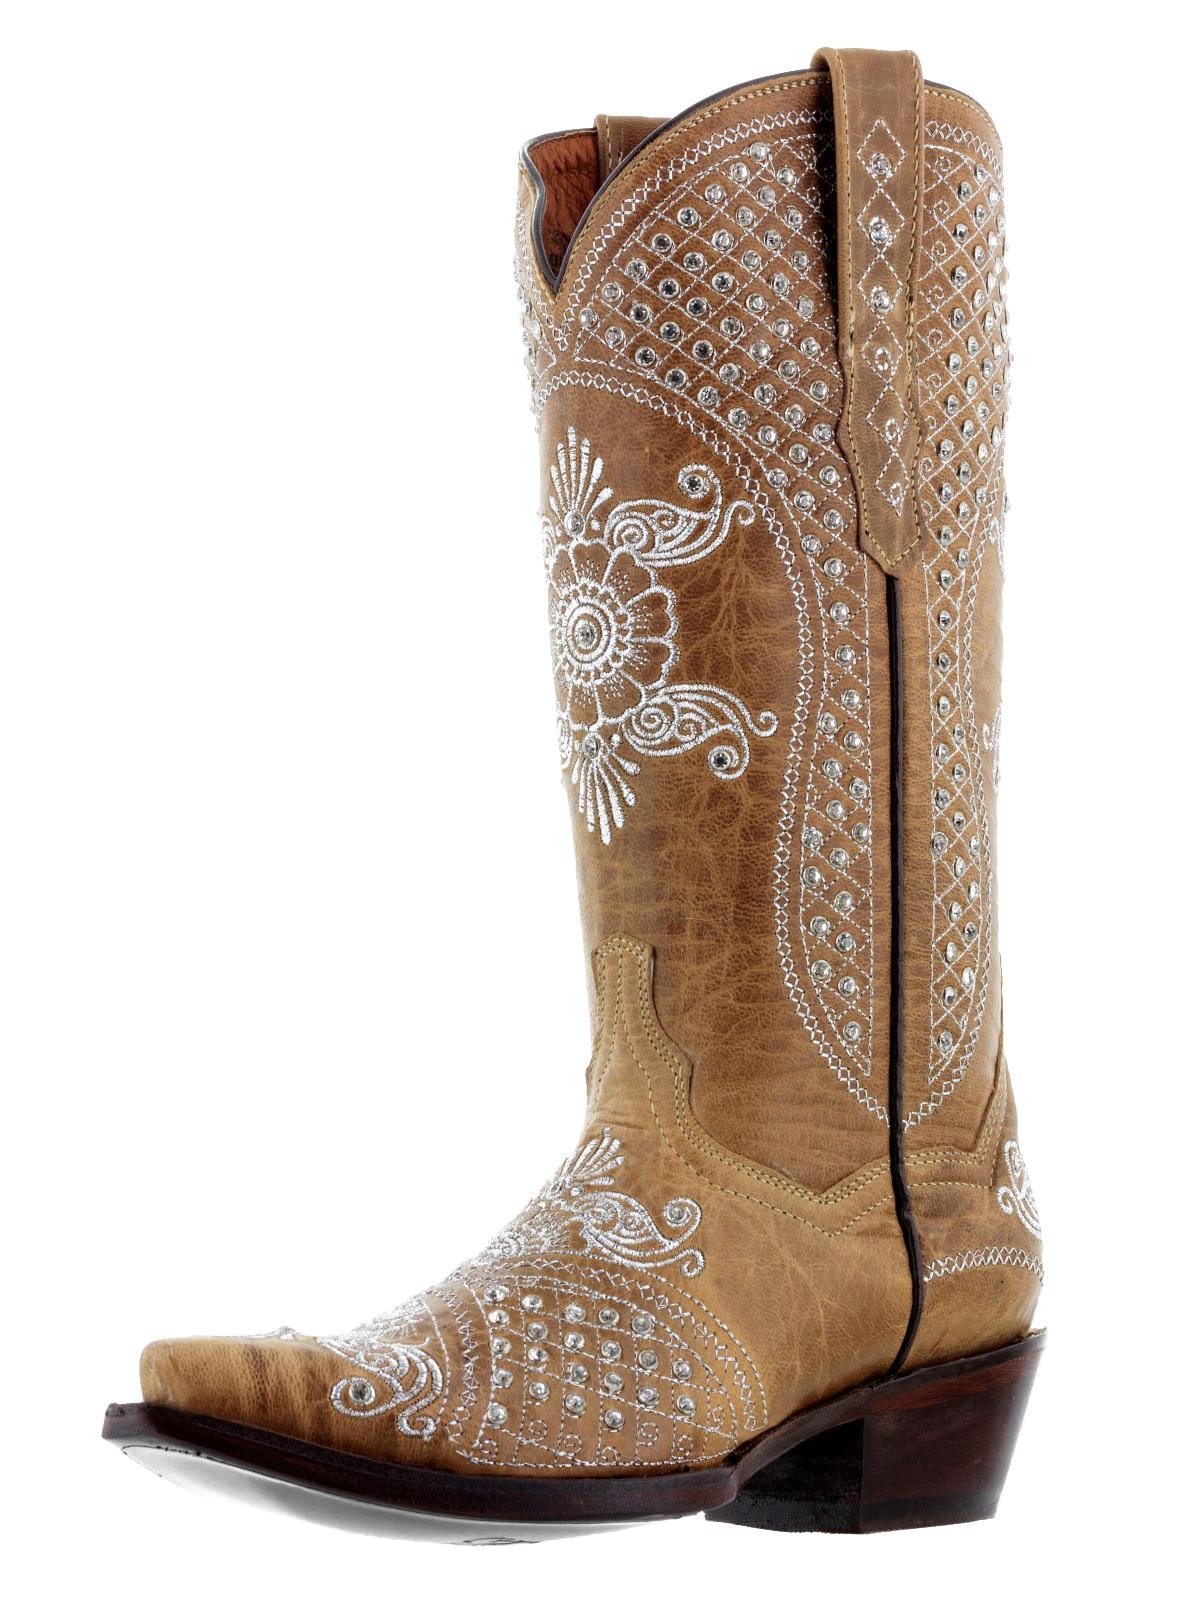 Womens Sand Tan Leather 670 Rhinestones Bridal Collection Western Cowboy Boots  eBay